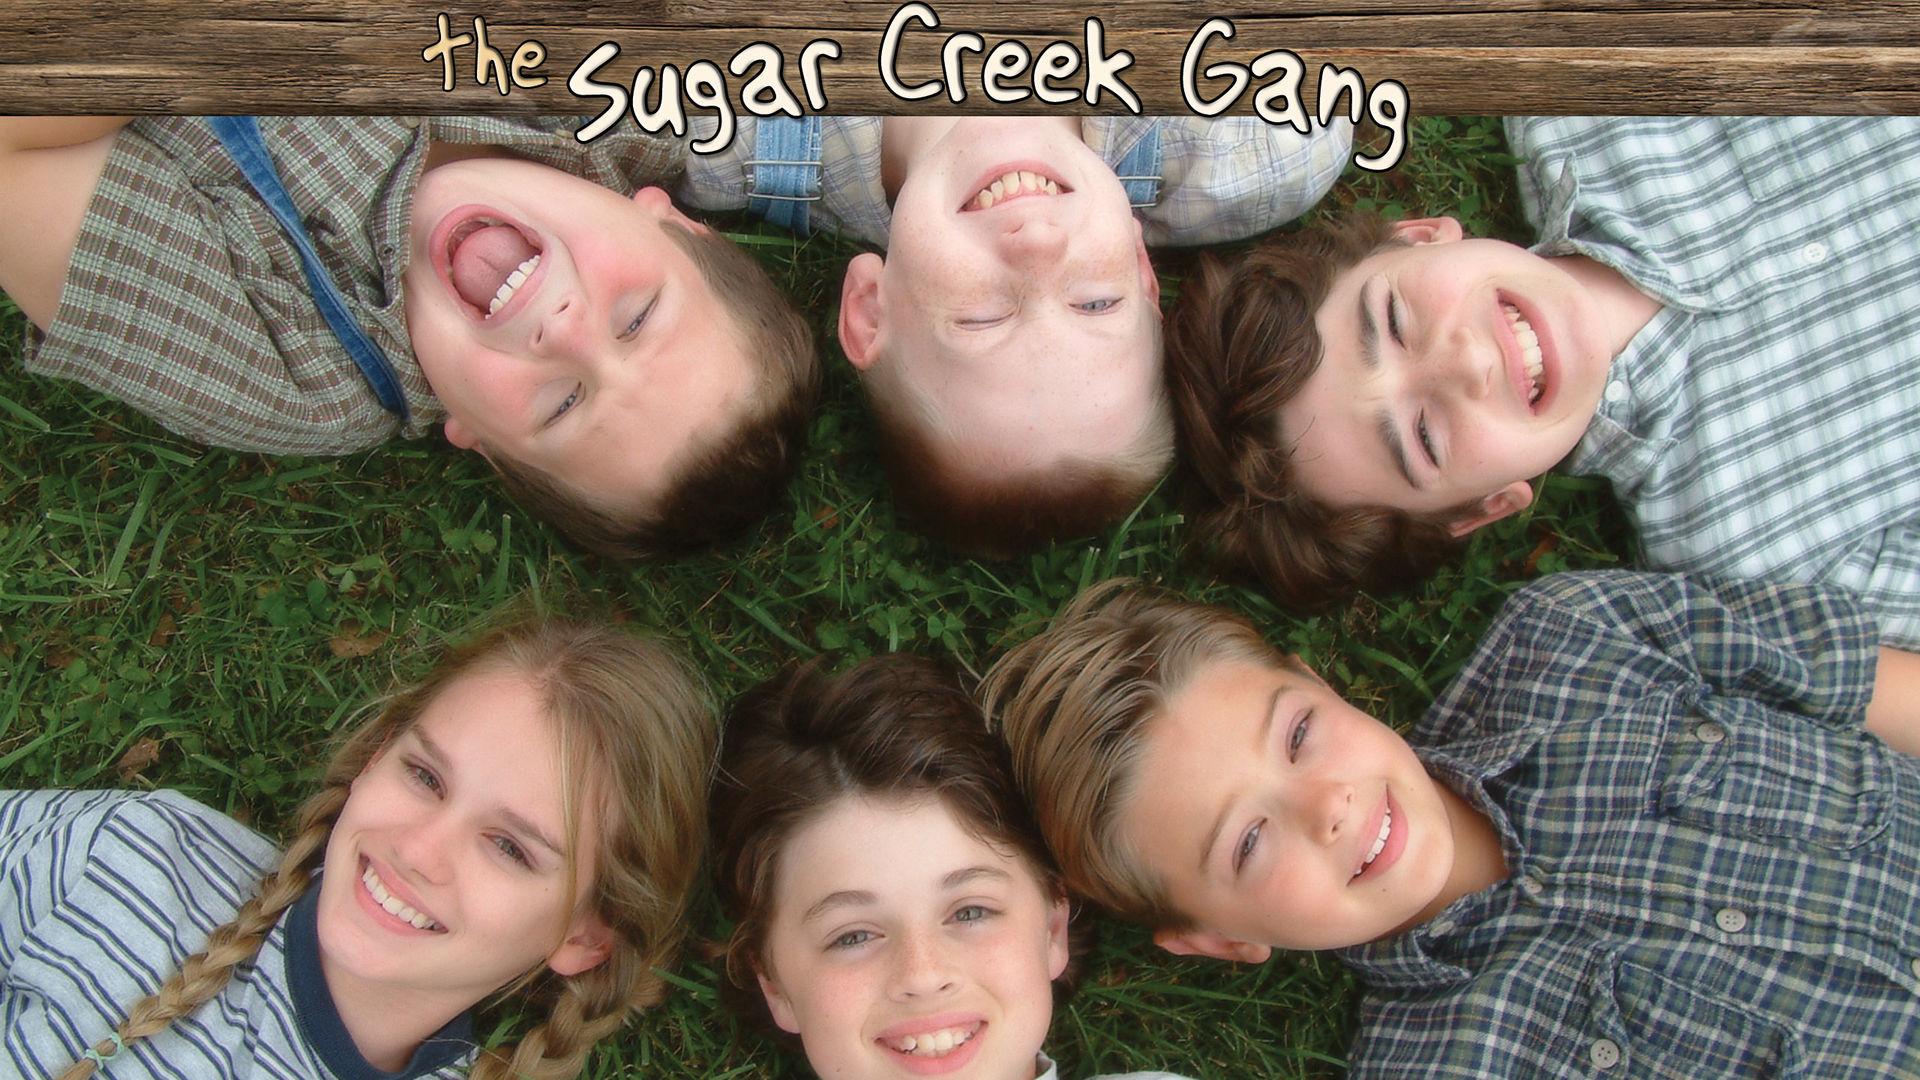 Sugar Creek 3 - Race Against Nightfall